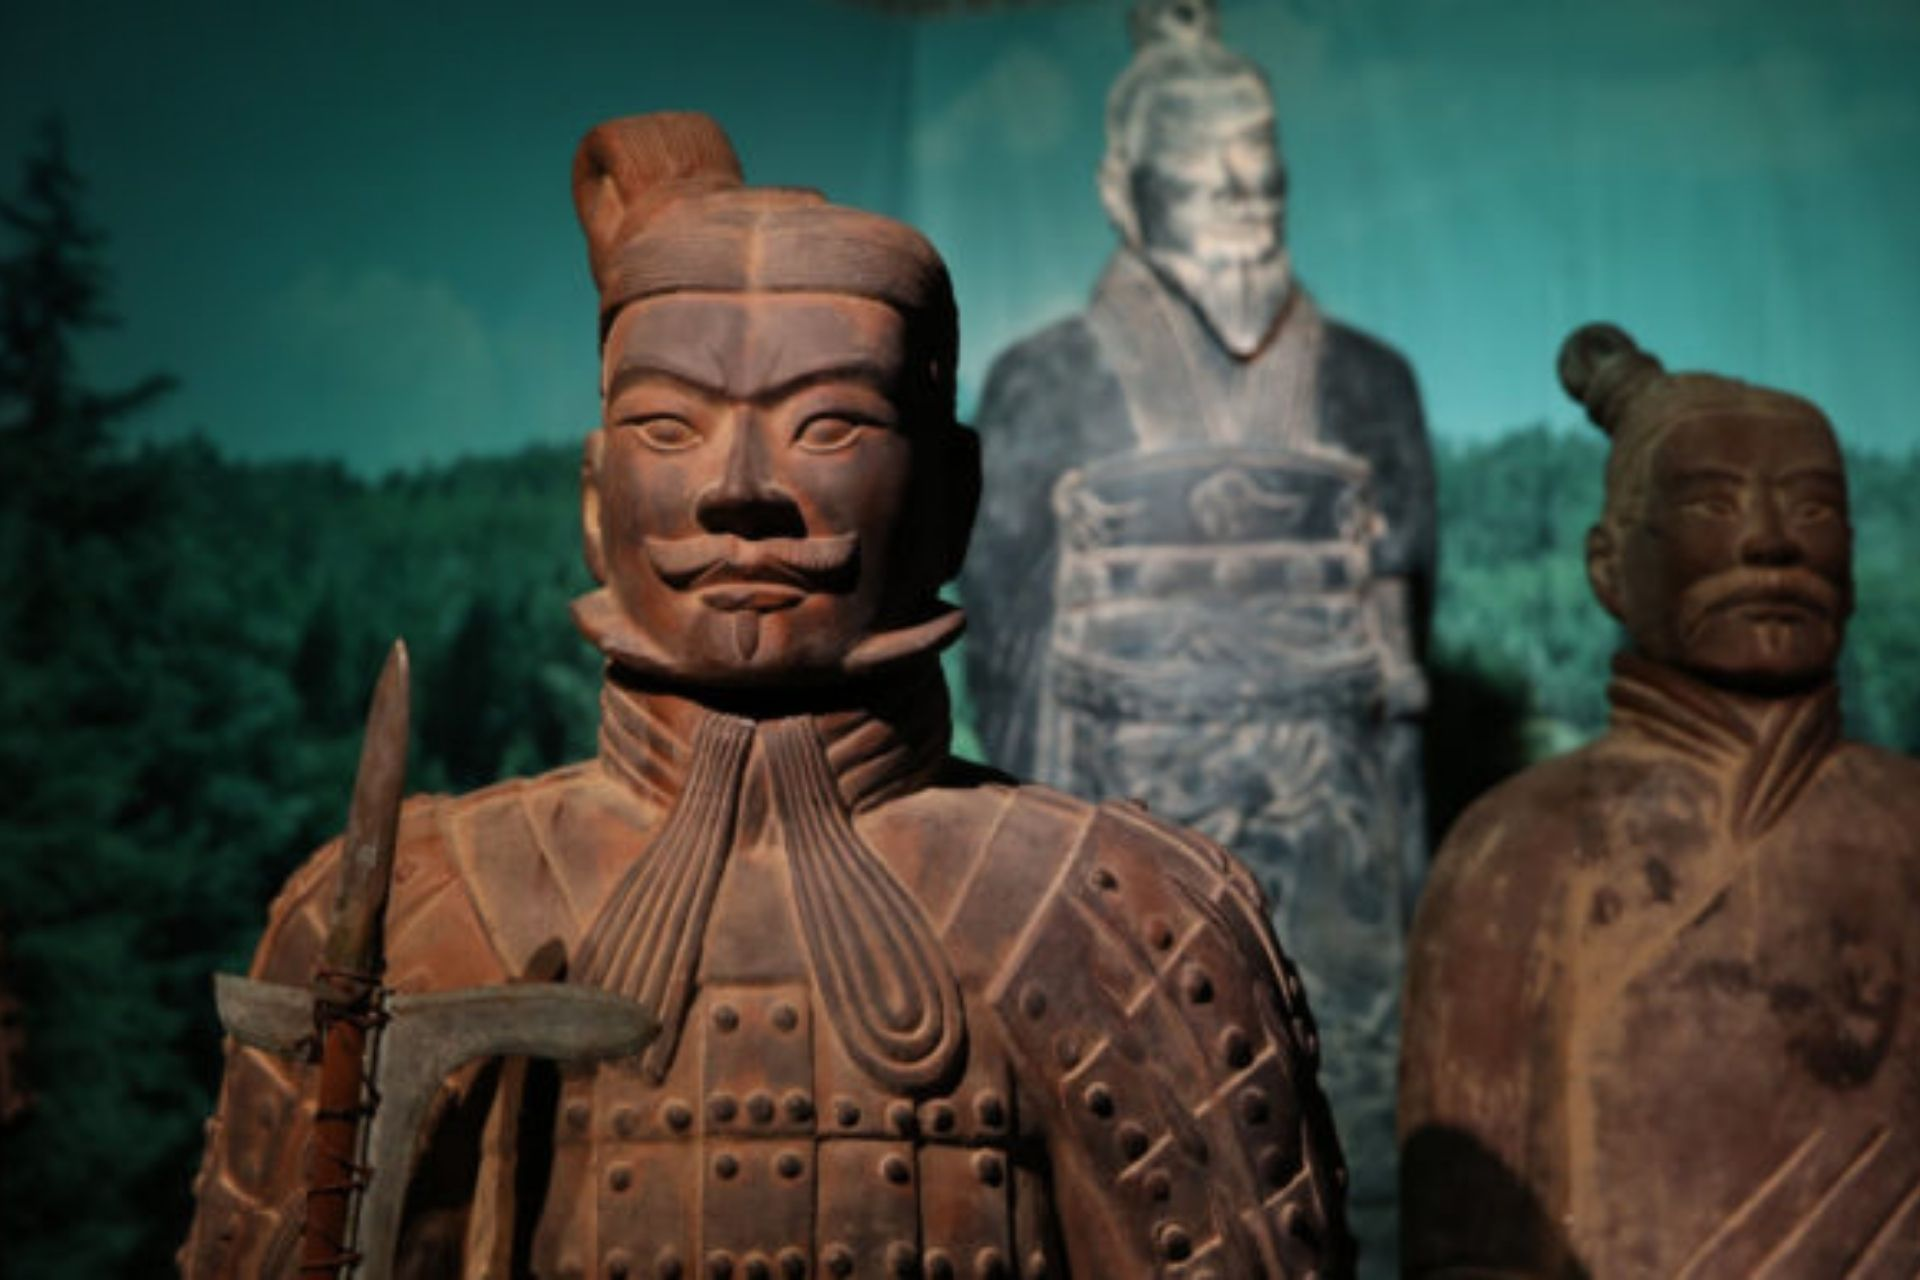 Mostra Esercito Terracotta Cina Milano